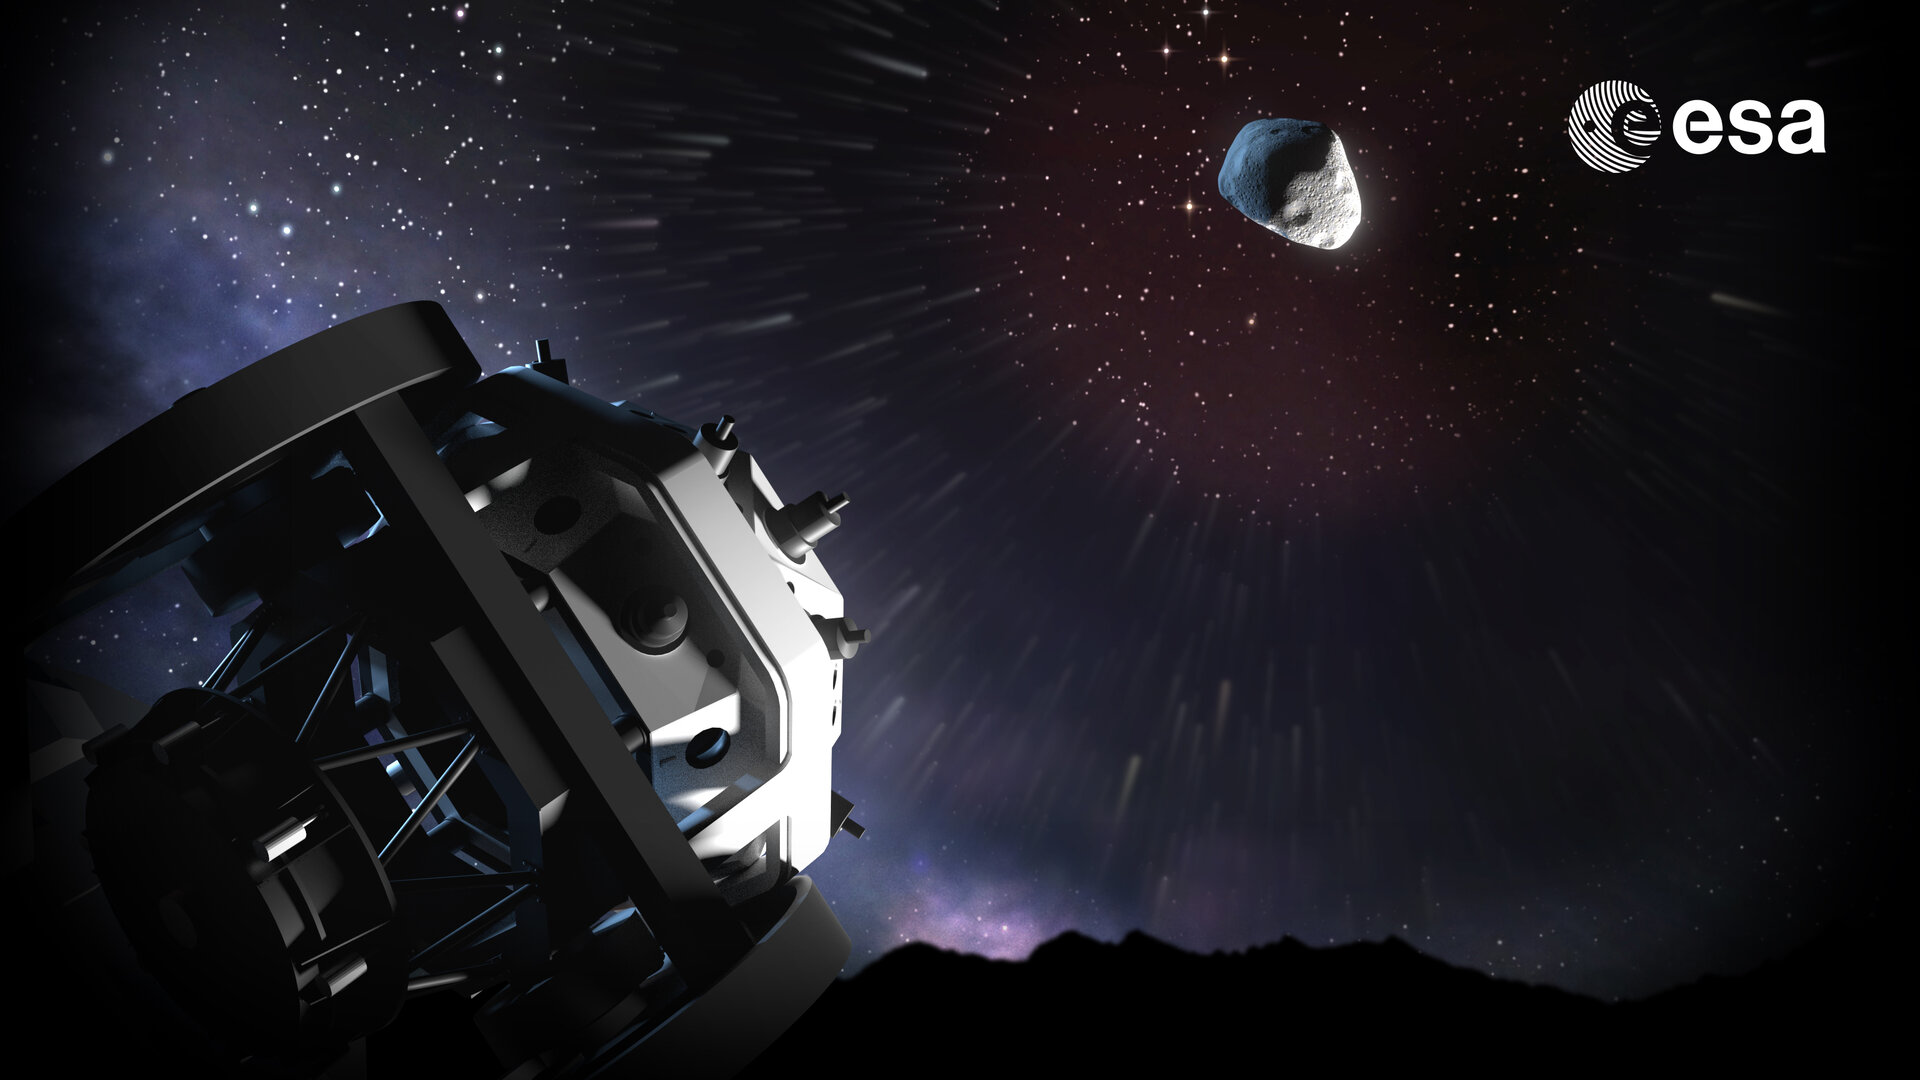 https://www.esa.int/var/esa/storage/images/esa_multimedia/images/2016/10/flyeye_telescope/16202471-1-eng-GB/Flyeye_telescope_pillars.jpg